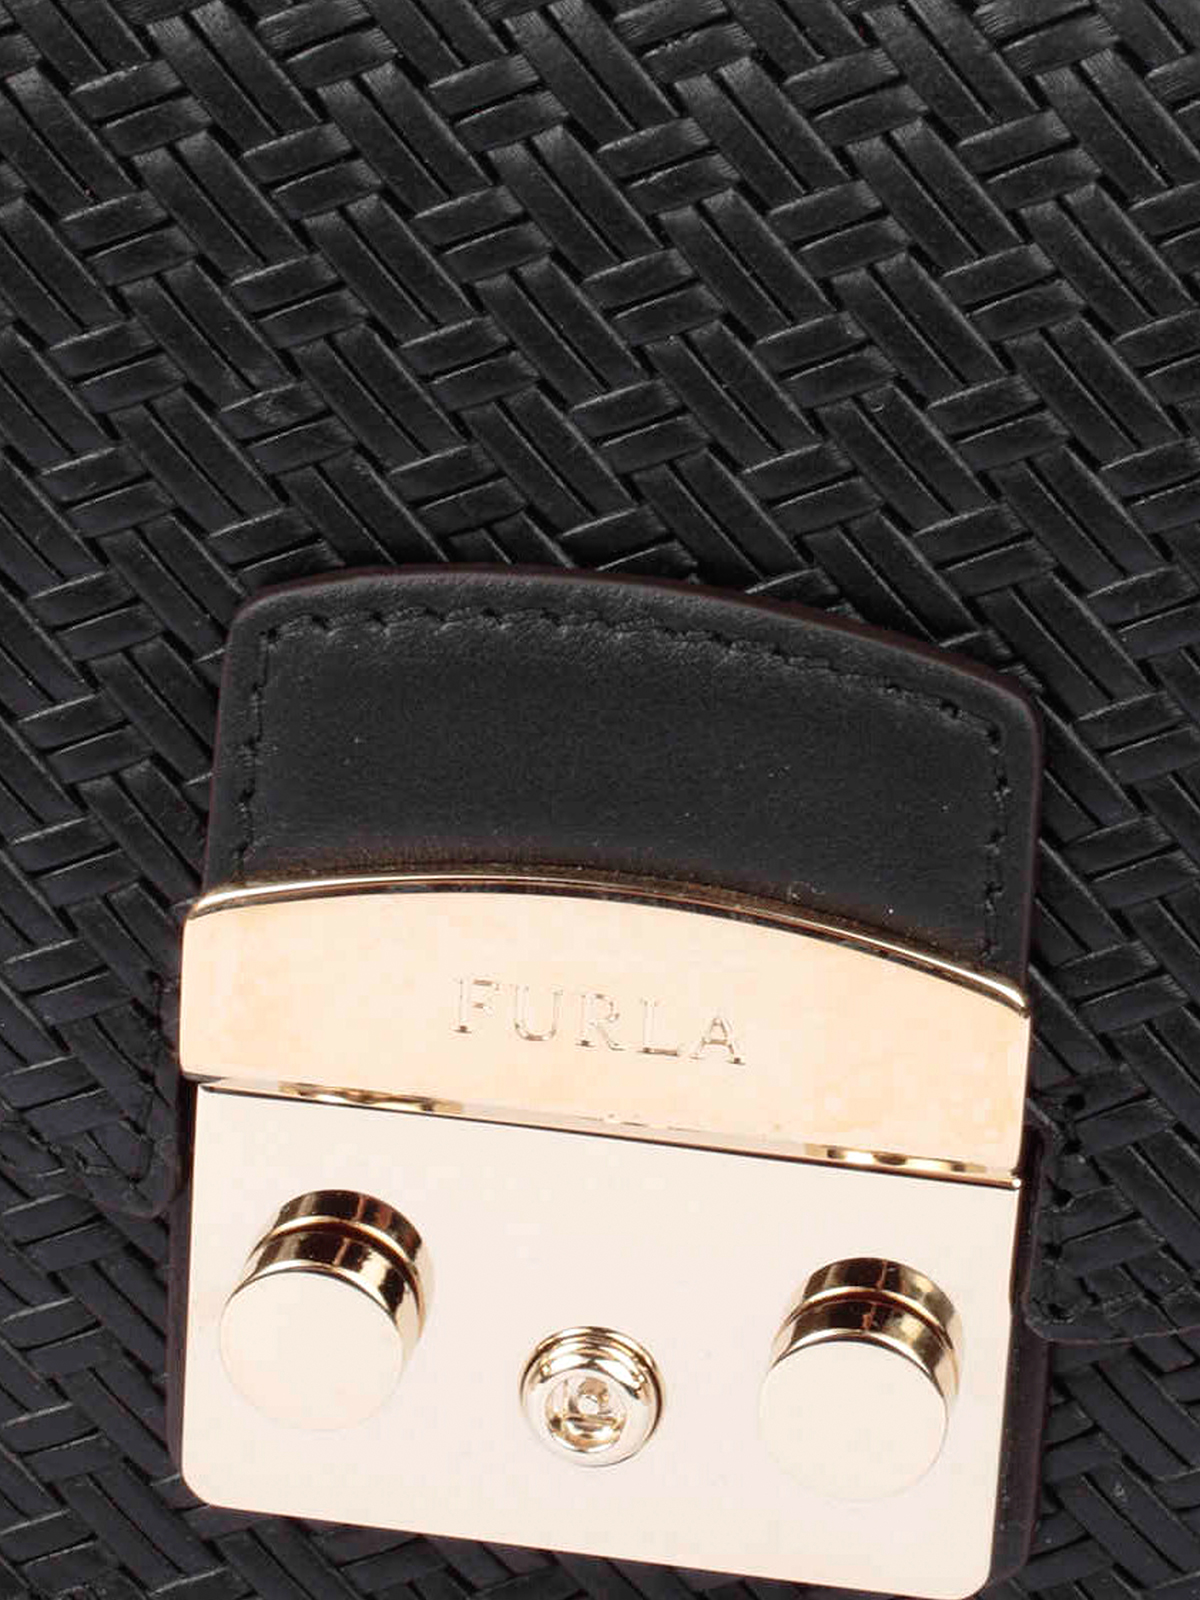 11db11cea26 Furla - Metropolis Gilda Mini leather bag - cross body bags - 887058